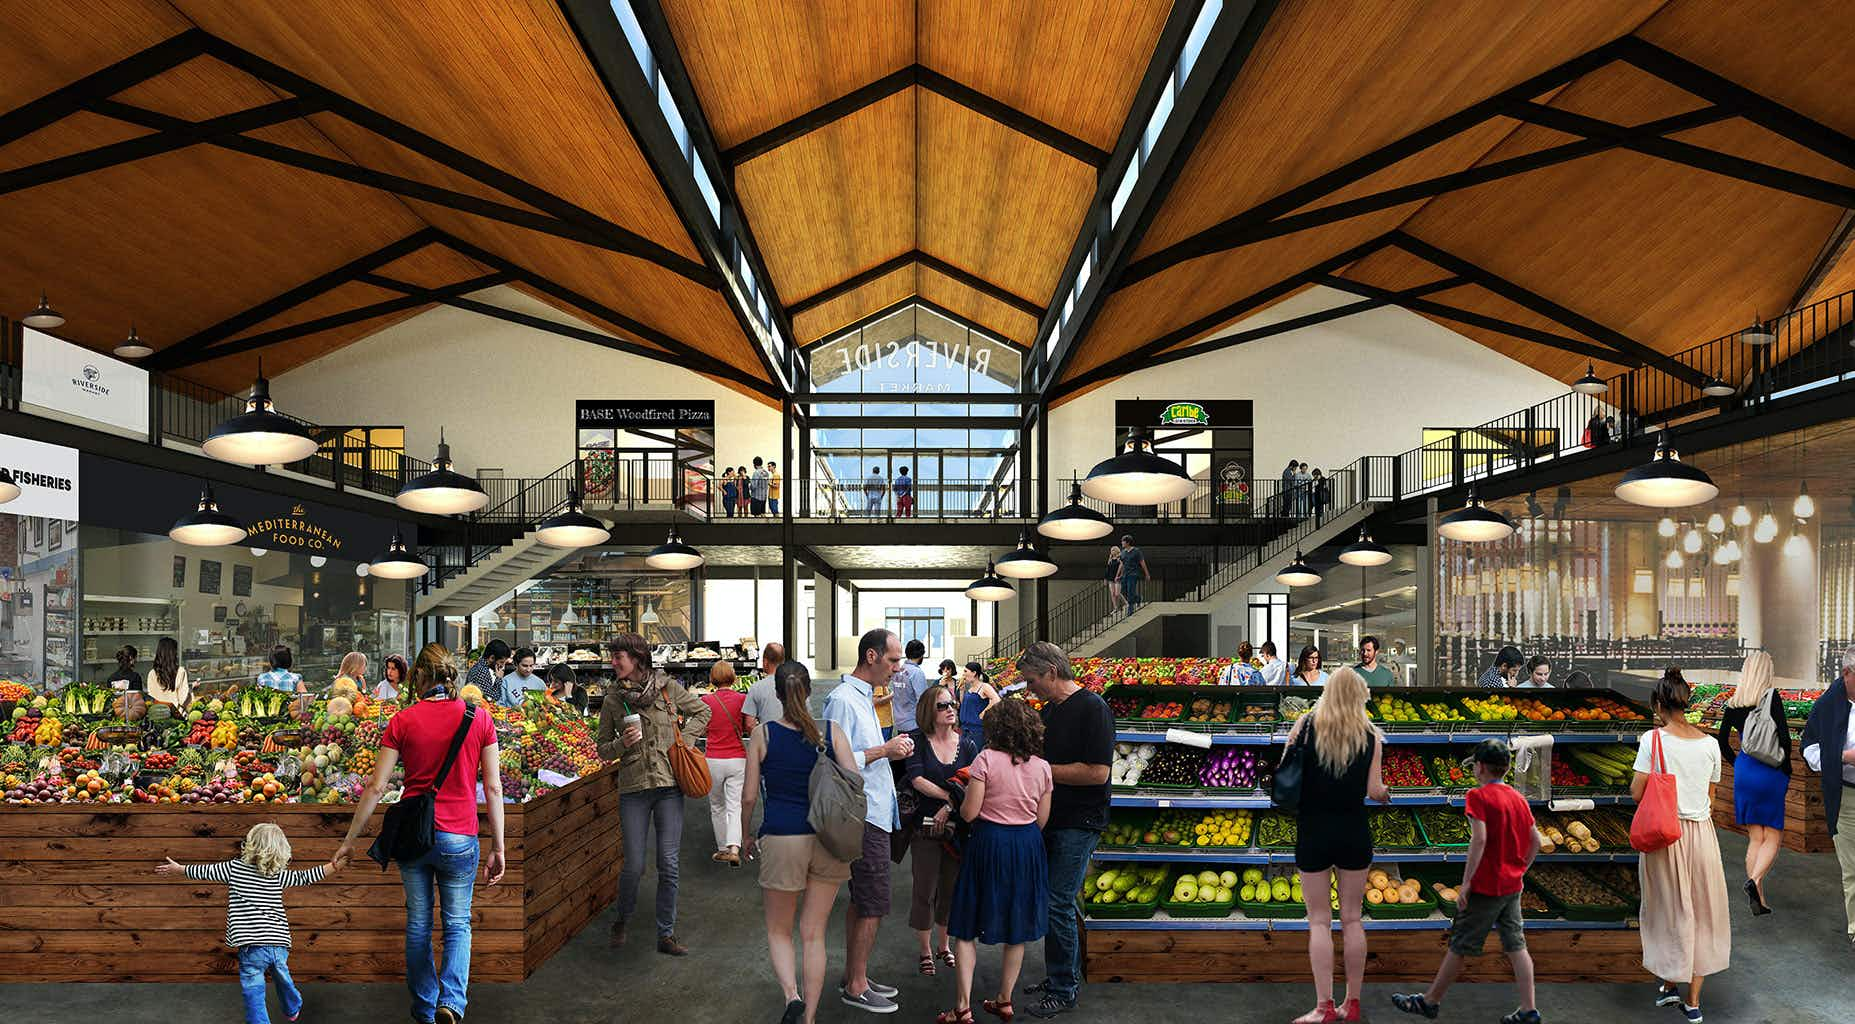 Riverside Market is bringing food-hall culture to Christchurch's CBD. Image by Riverside Market